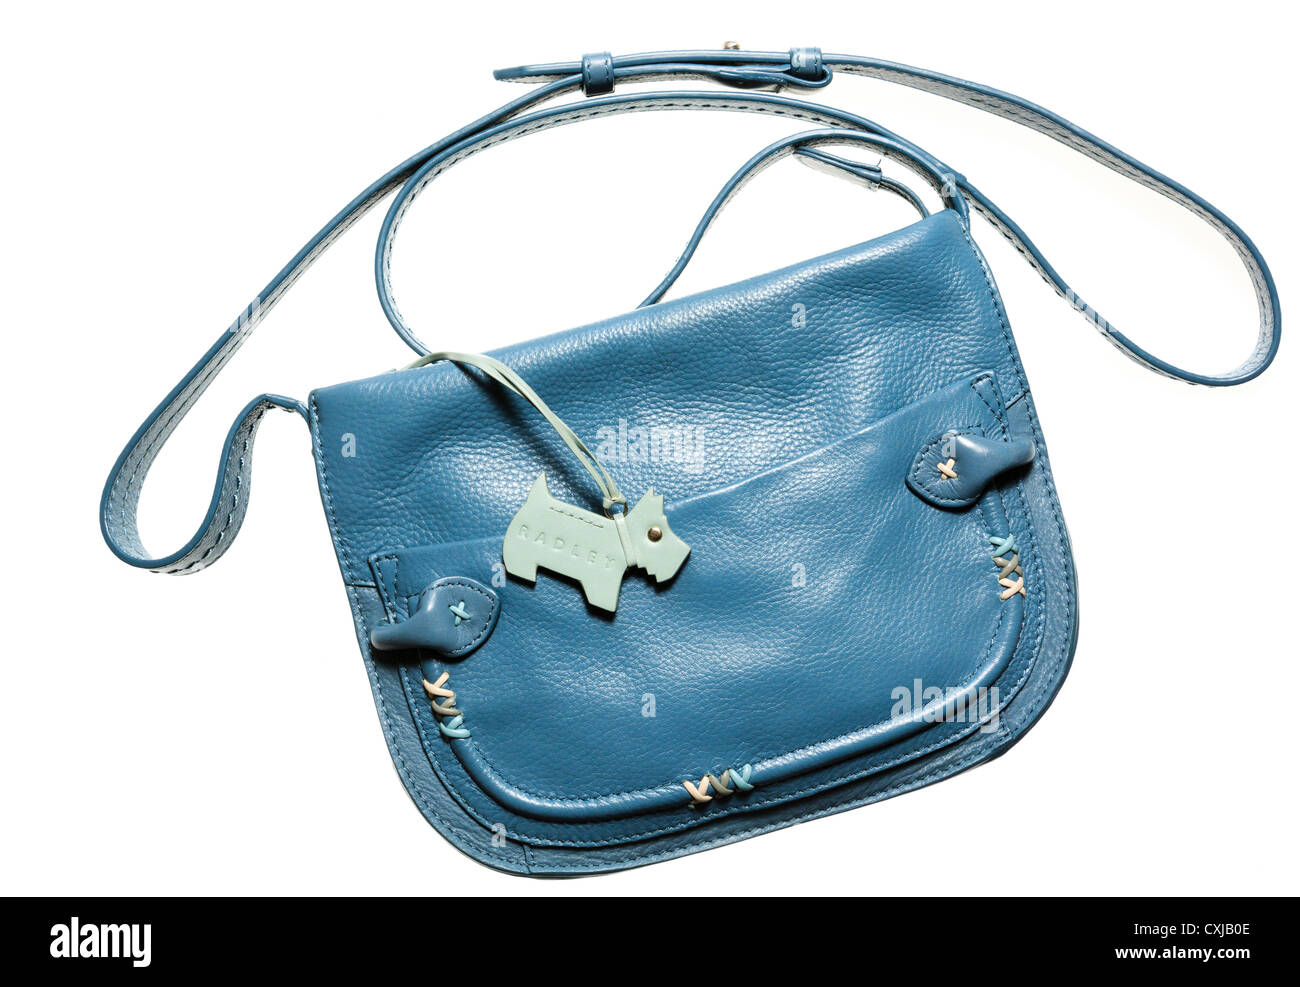 Radley Designer Handbag In Blue Leather With Scottie Dog